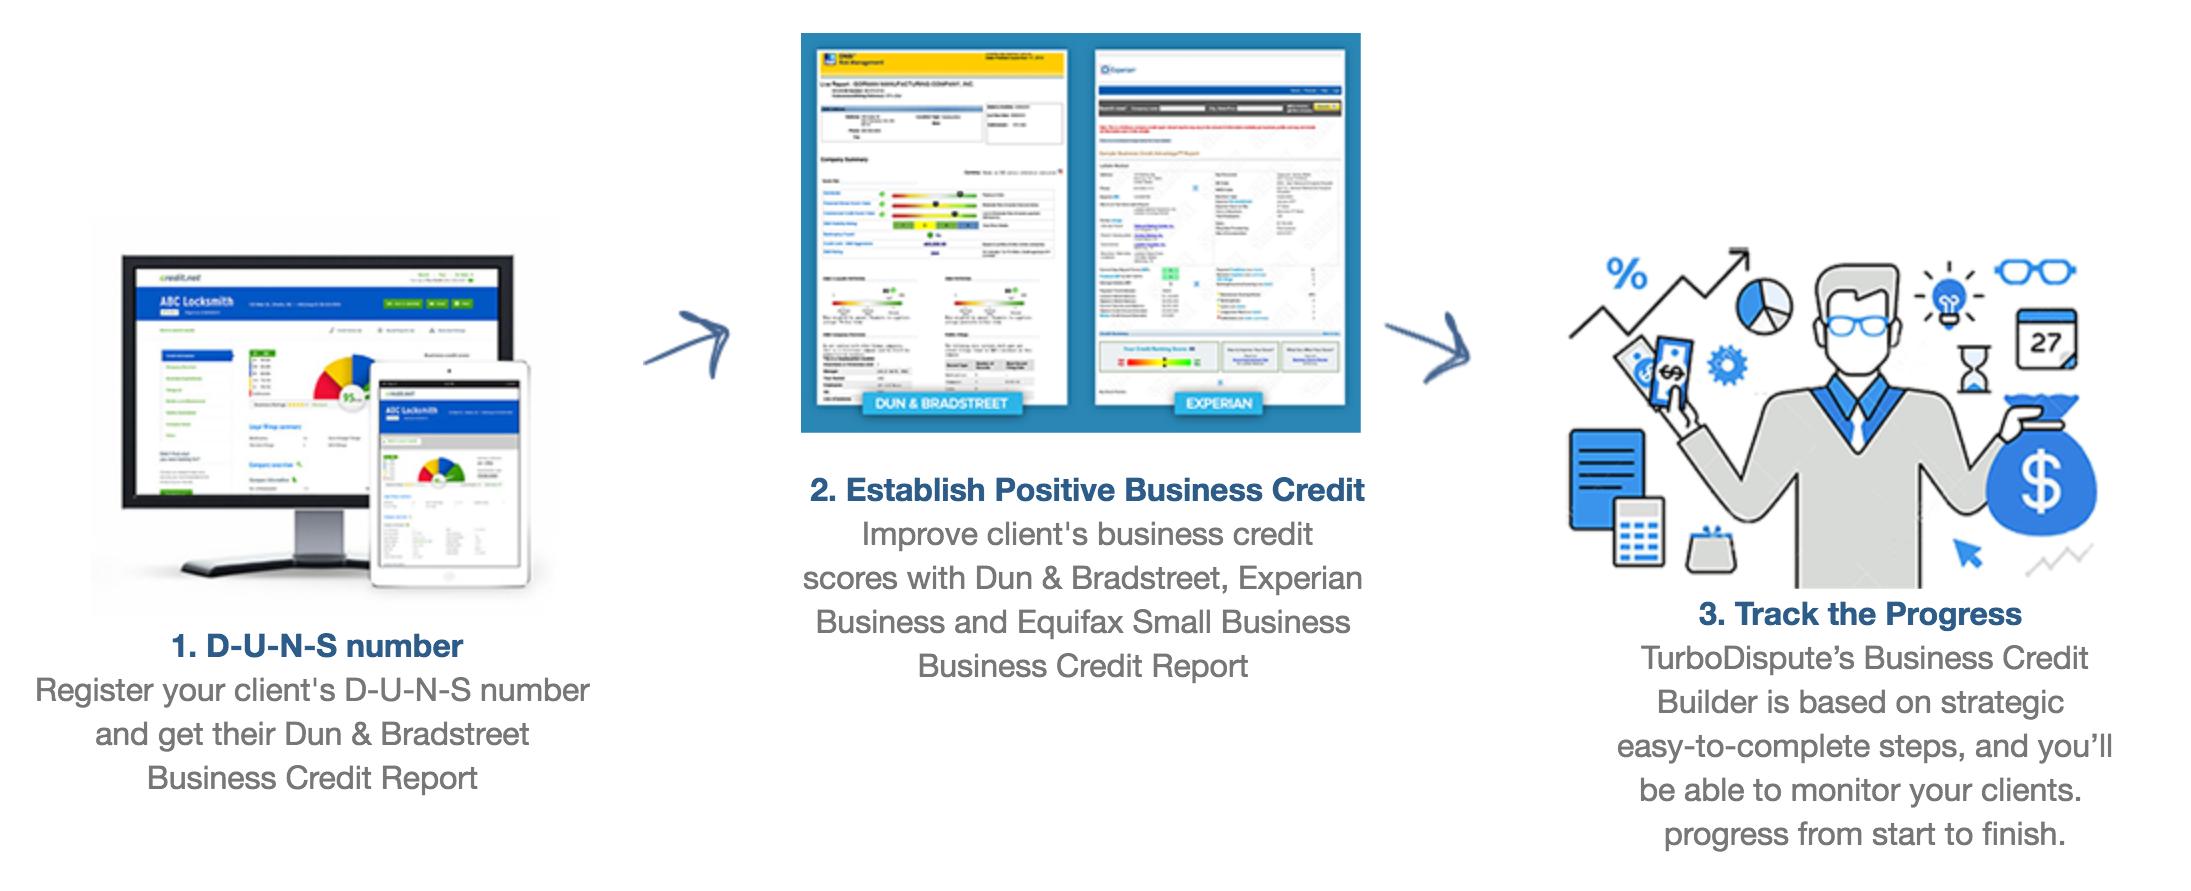 TurboDispute | Credit Repair Business Software CRM | Try it FREE!